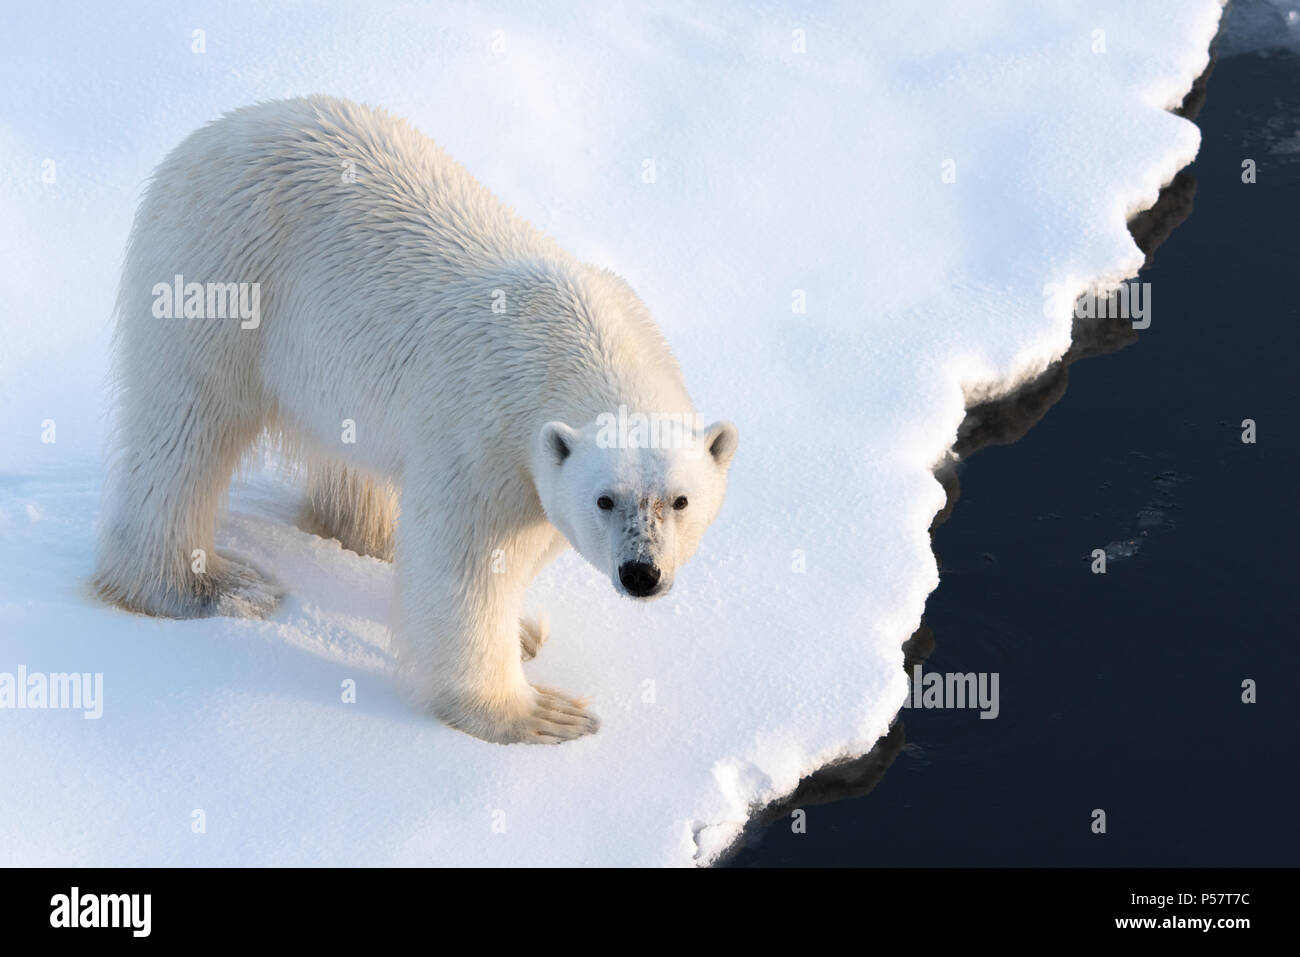 Cerrar el Oso Polar mirando a la cámara Imagen De Stock